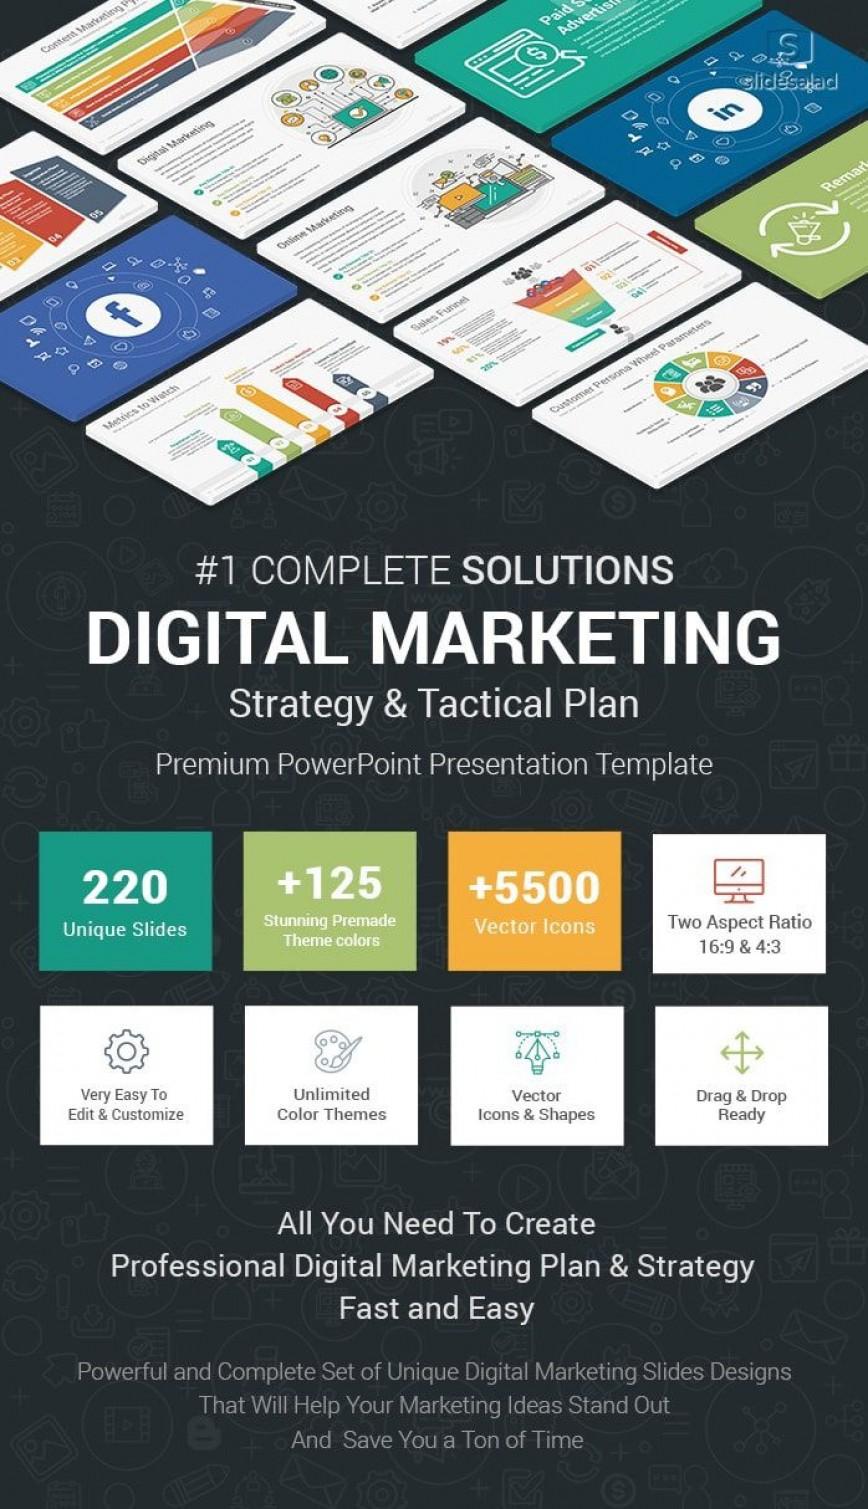 007 Impressive Digital Marketing Plan Example Ppt High Resolution